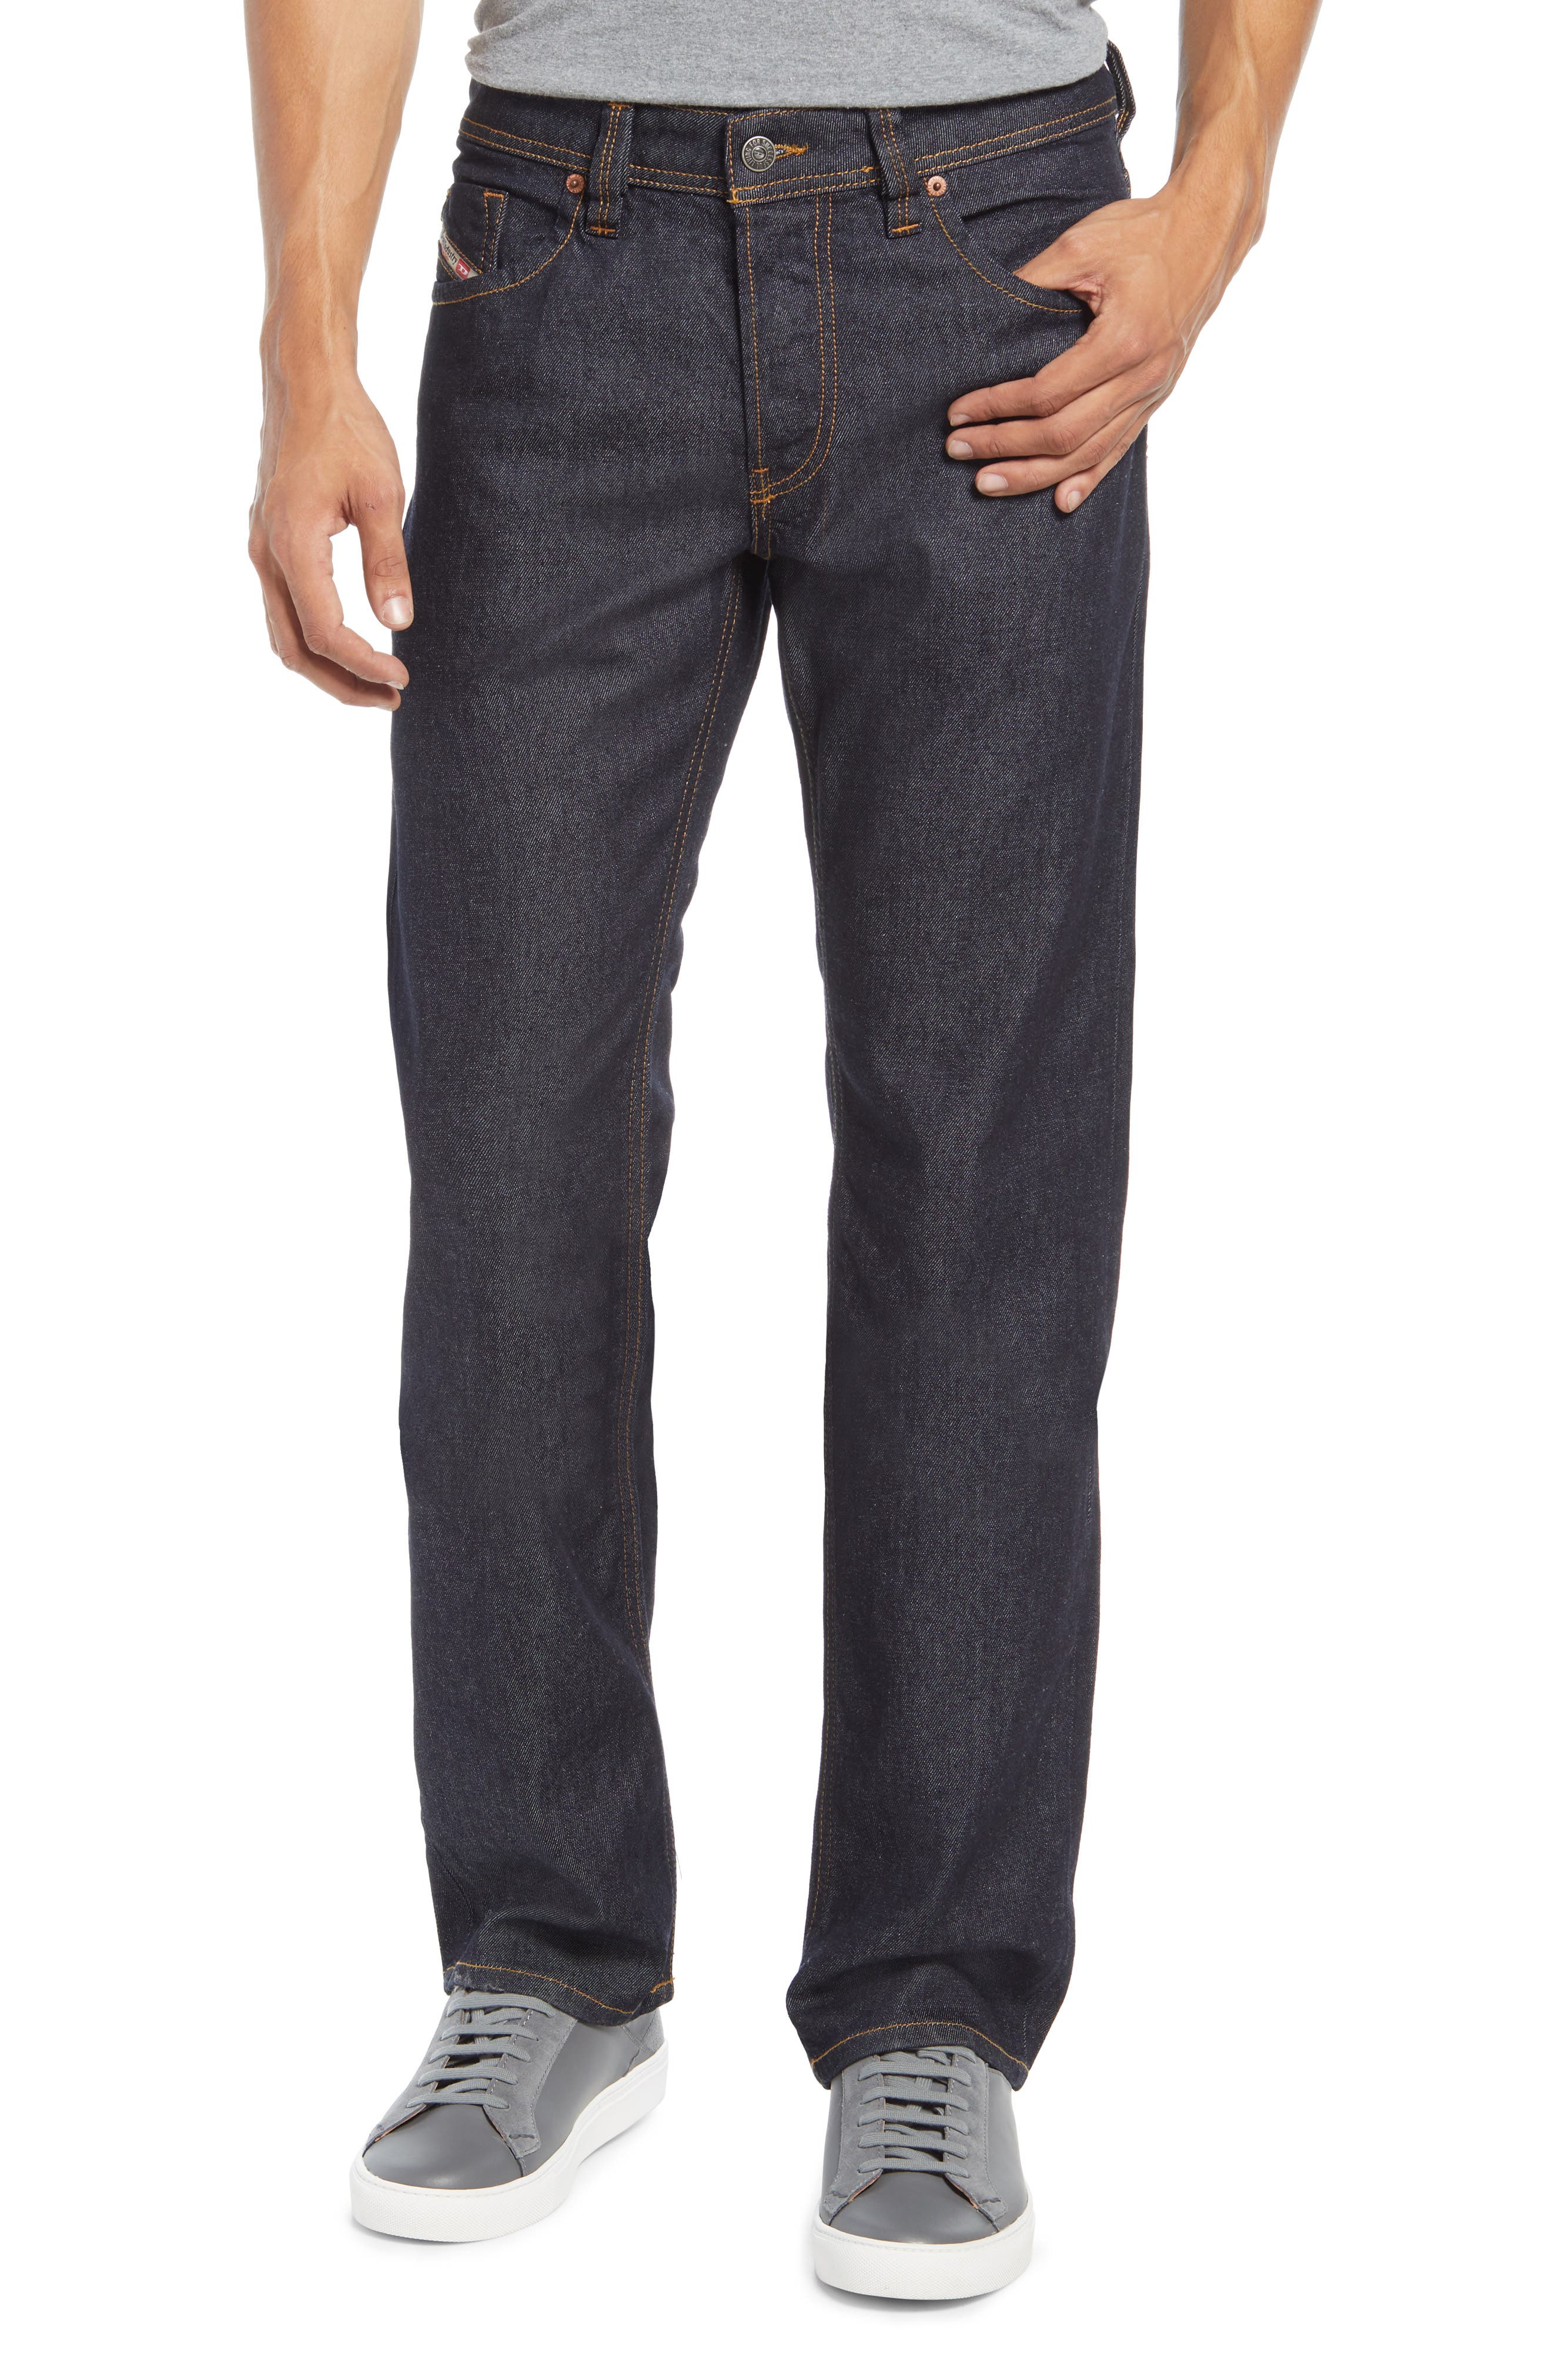 Men's Diesel Larkee Relaxed Fit Straight Leg Jeans